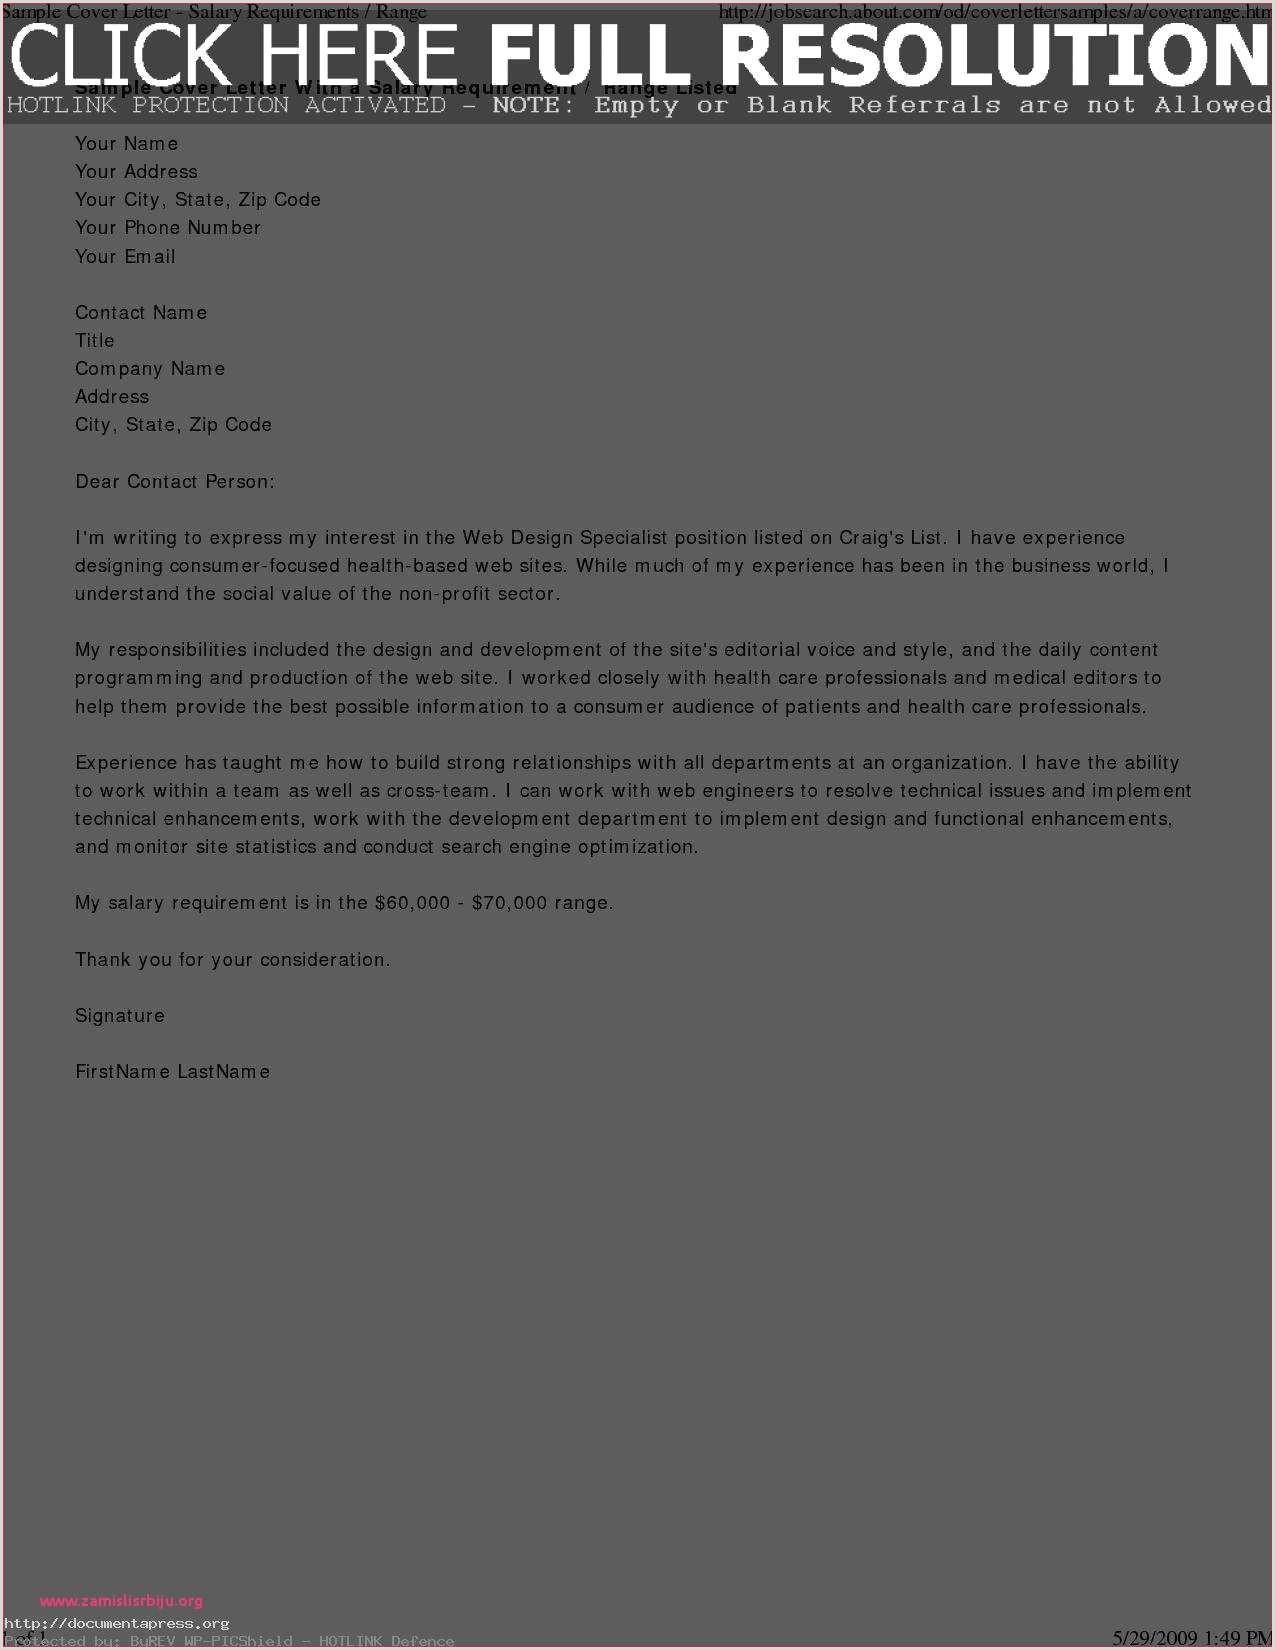 Software Engineer Cover Letter Sample Luxury Web Developer